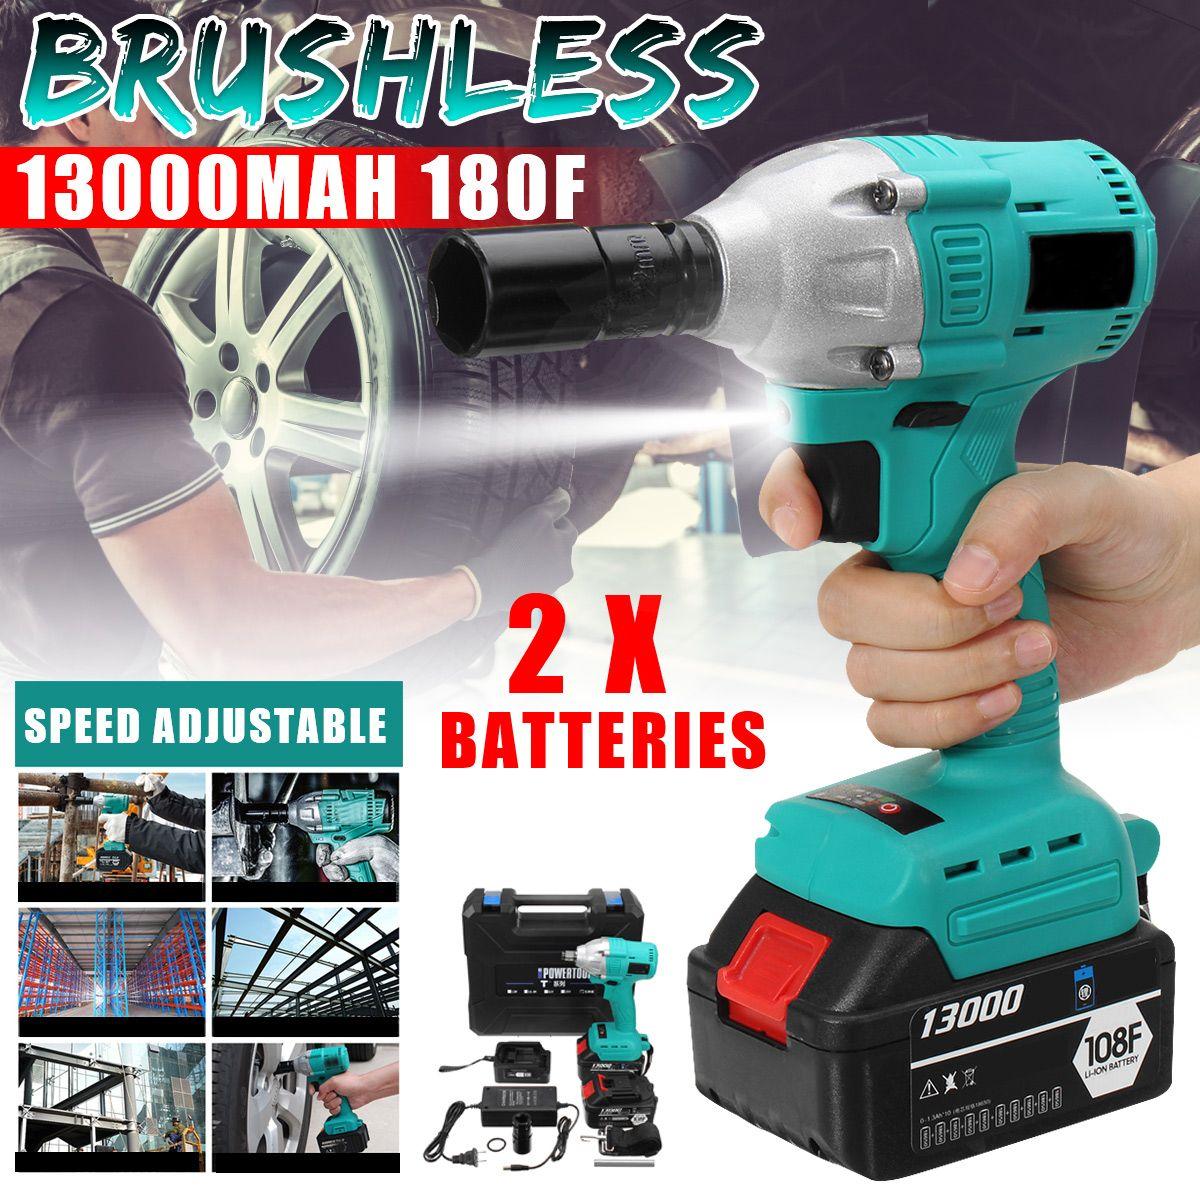 Brushless Electric Shock Cordless Impact Wrench 340 N.M Cordless DIY Household Electric Wrench w/2Pcs 108F 13000mAh Batteries